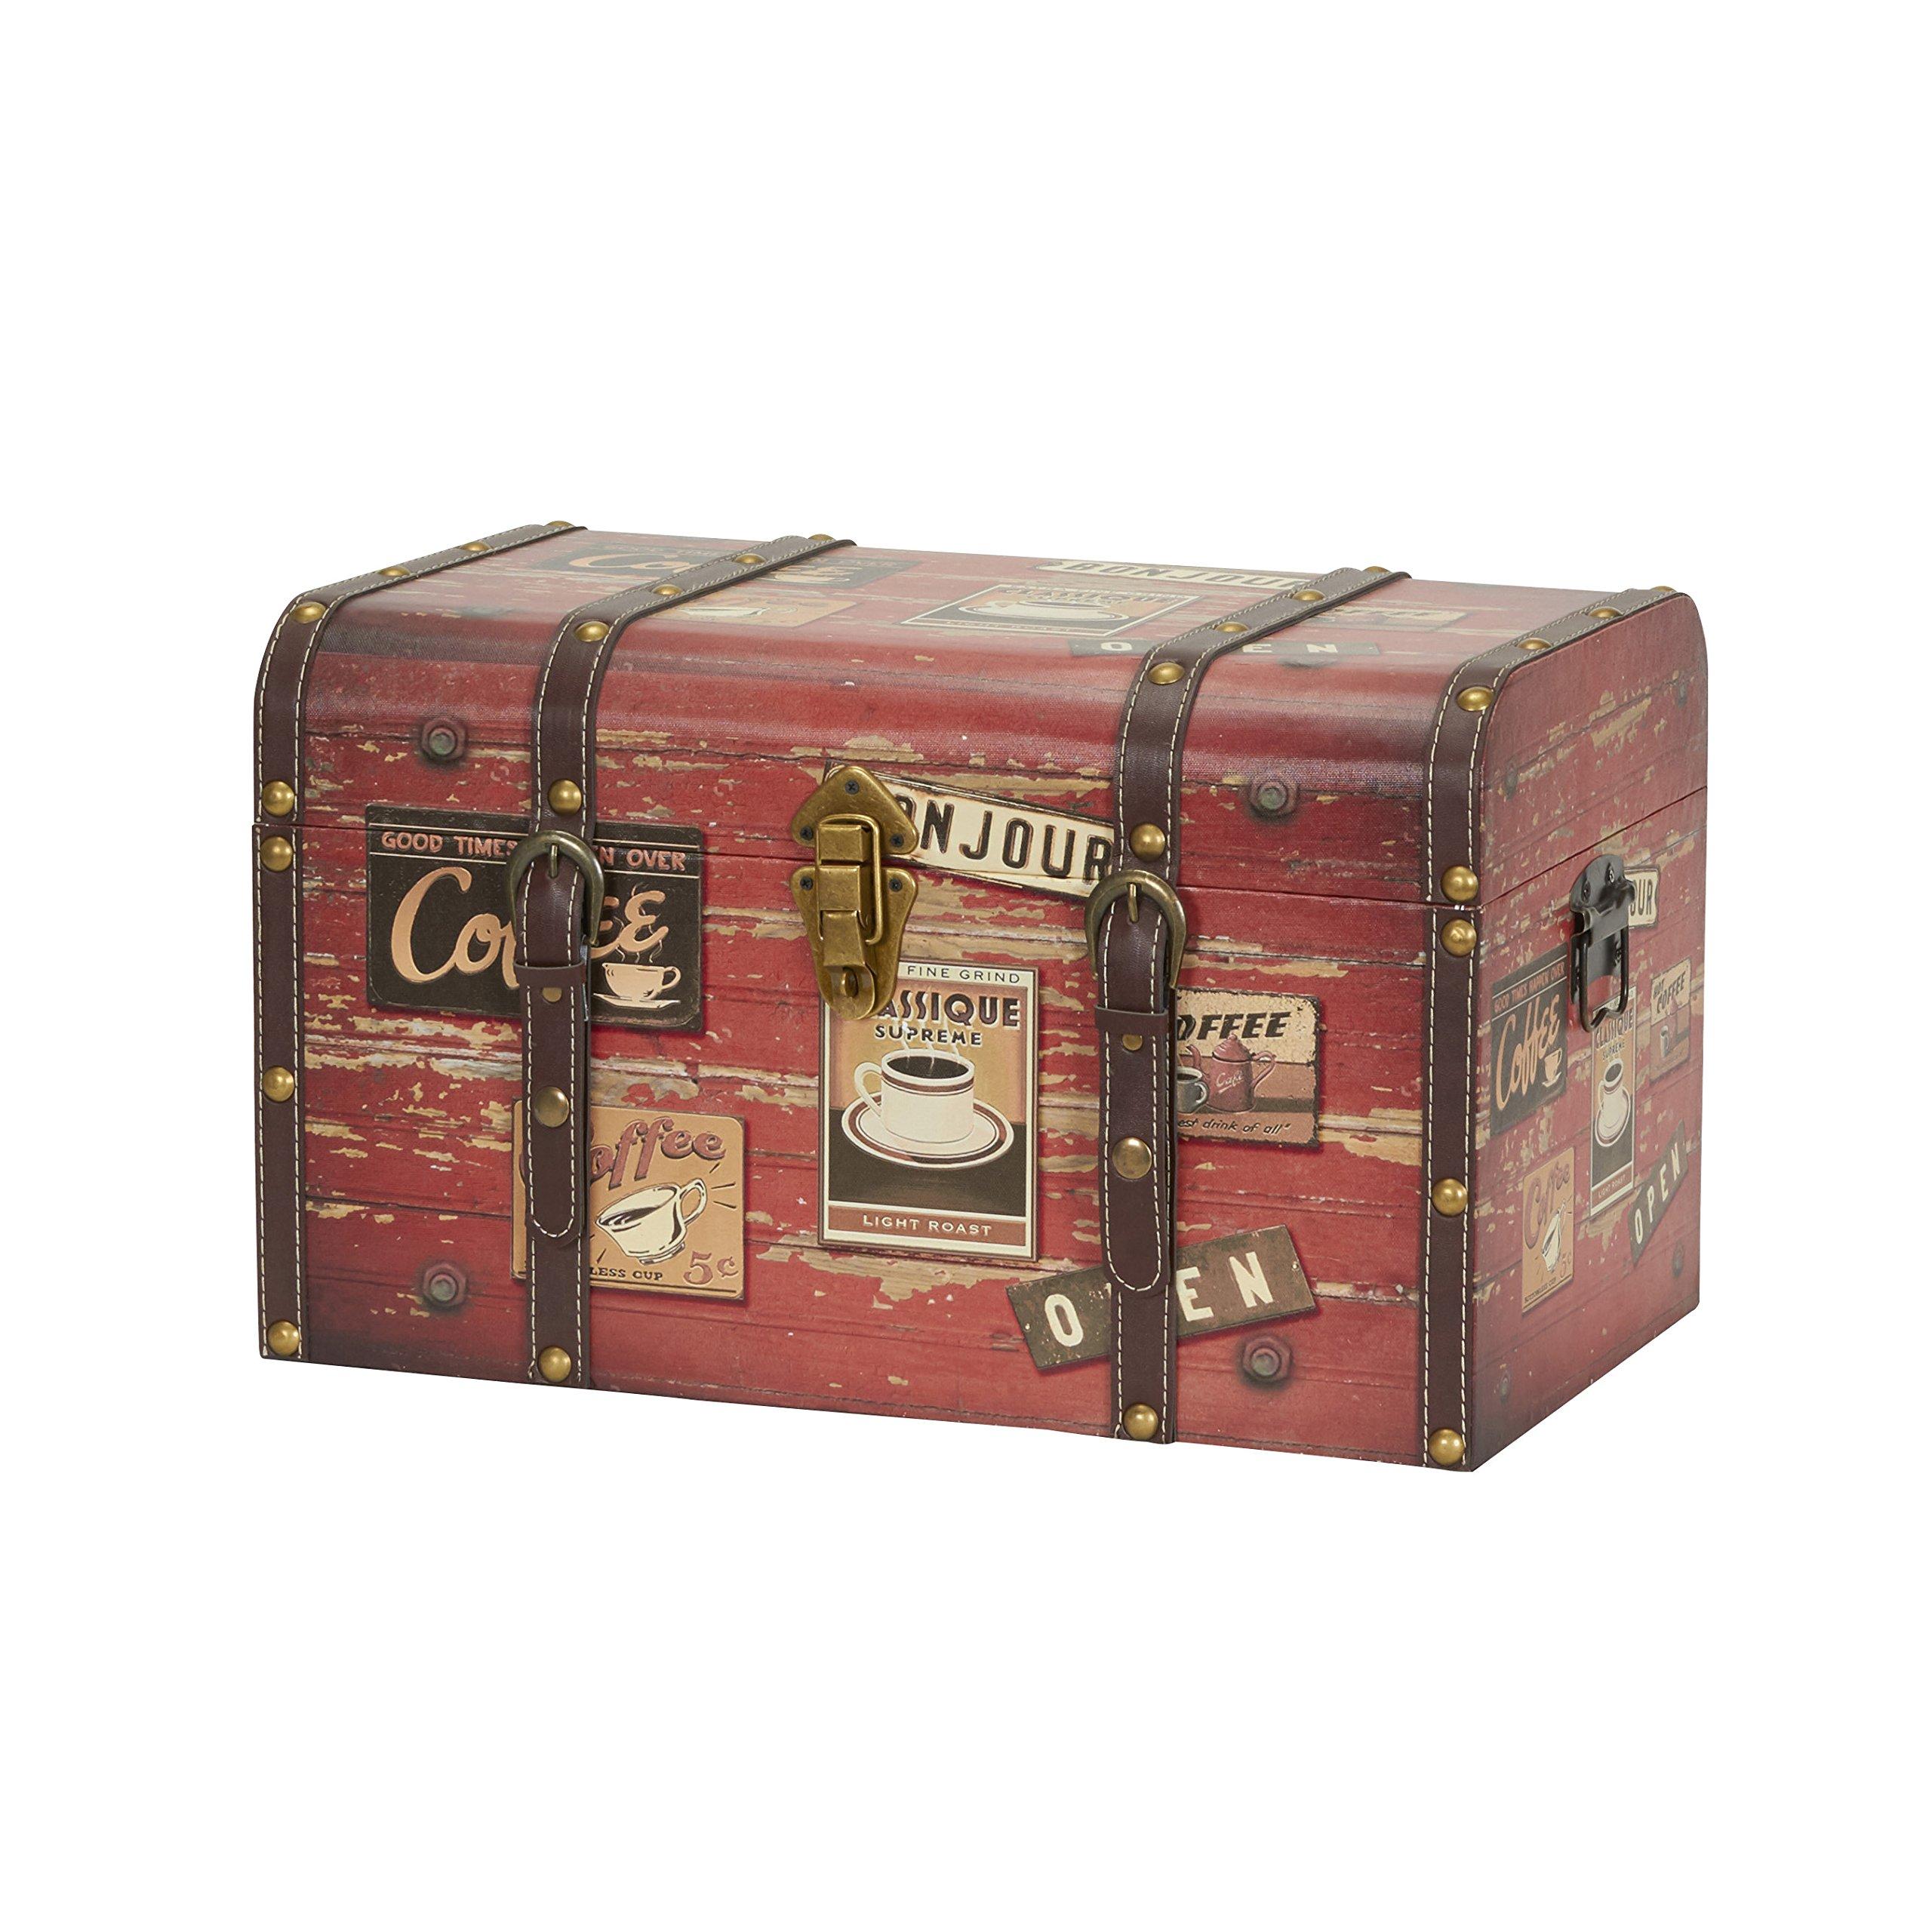 Household Essentials 9245-1 Medium Decorative Home Storage Trunk - Luggage Style - Coffee Shop Design by Household Essentials